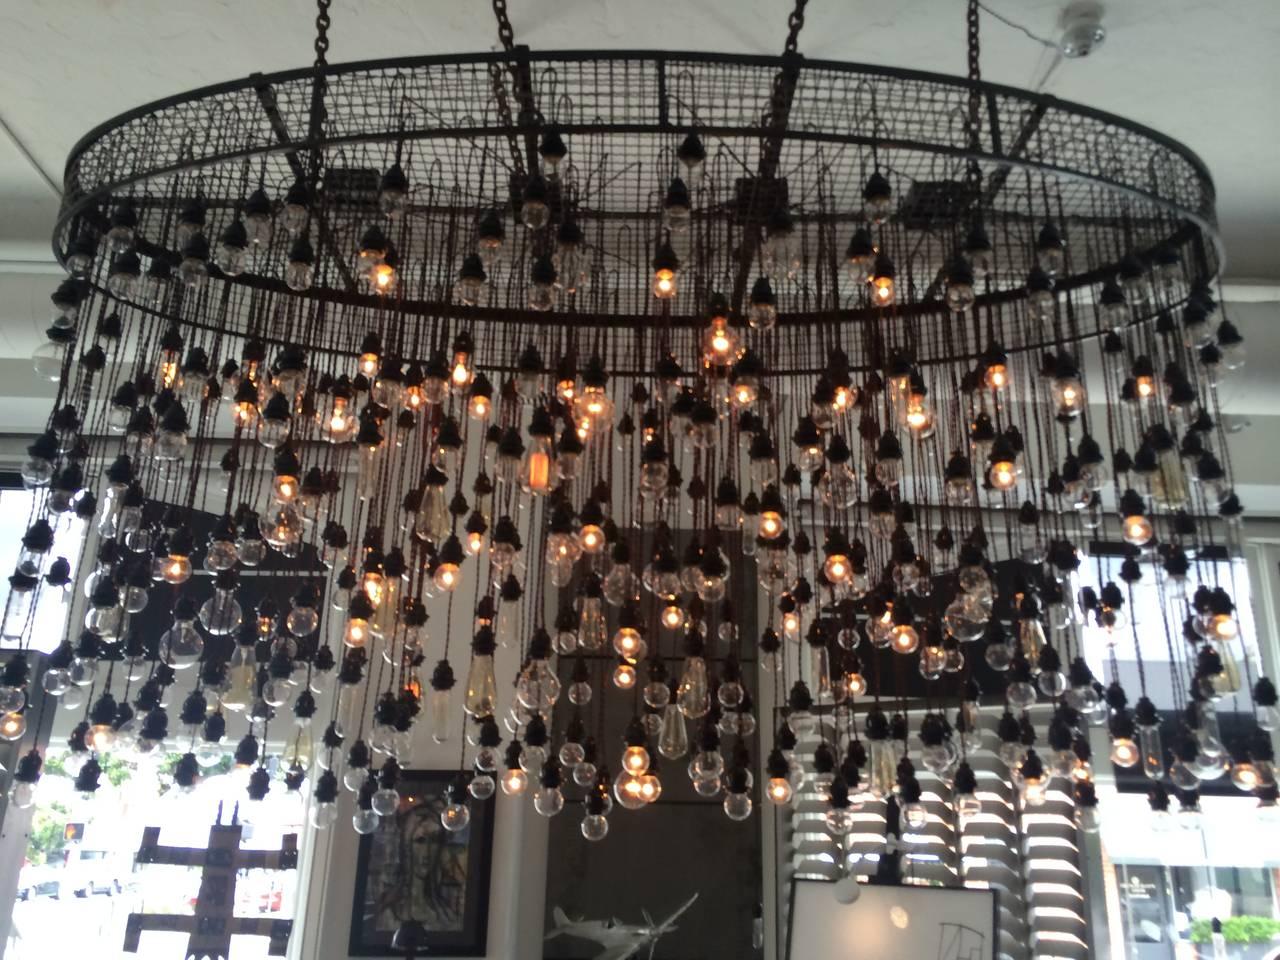 chandelier marvelous chandeliers industrial home inspirational